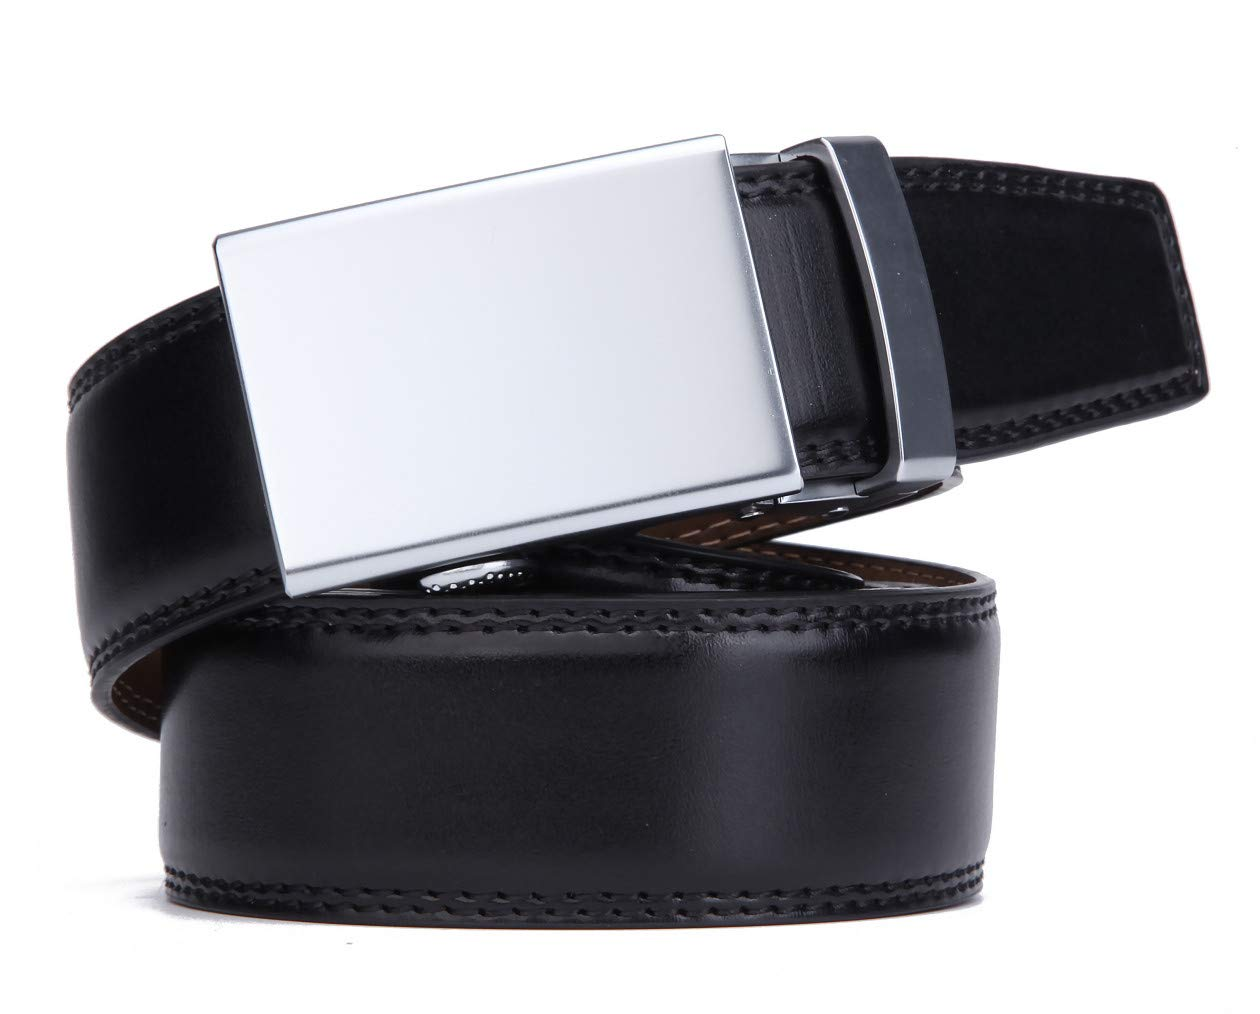 brown3, Up to 44 waist adjustable Mens Belt,Nelbons Slide Ratchet Belt for Men with Genuine Leather 1 3//8,Trim to Fit